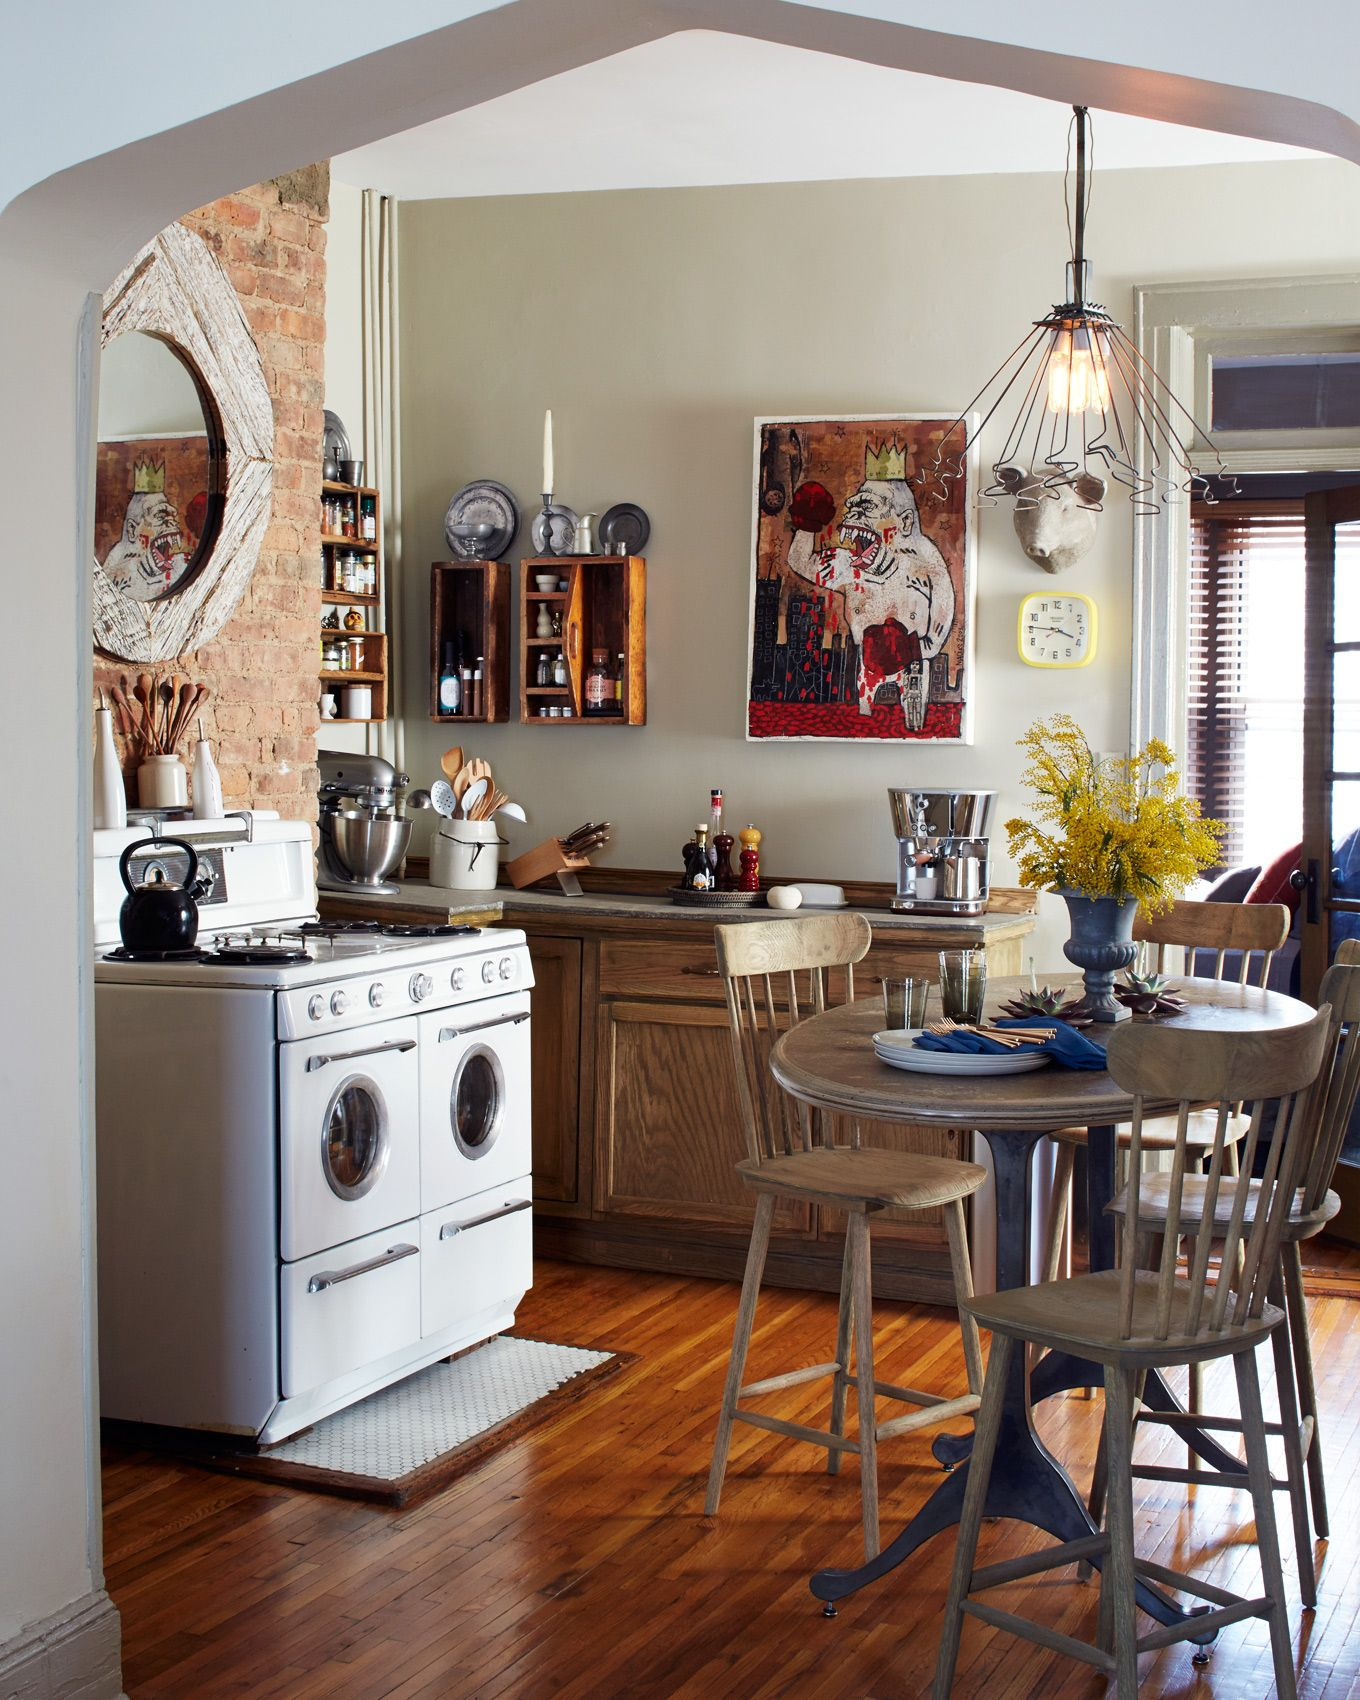 ChristopherWhite-Kitchen.jpg